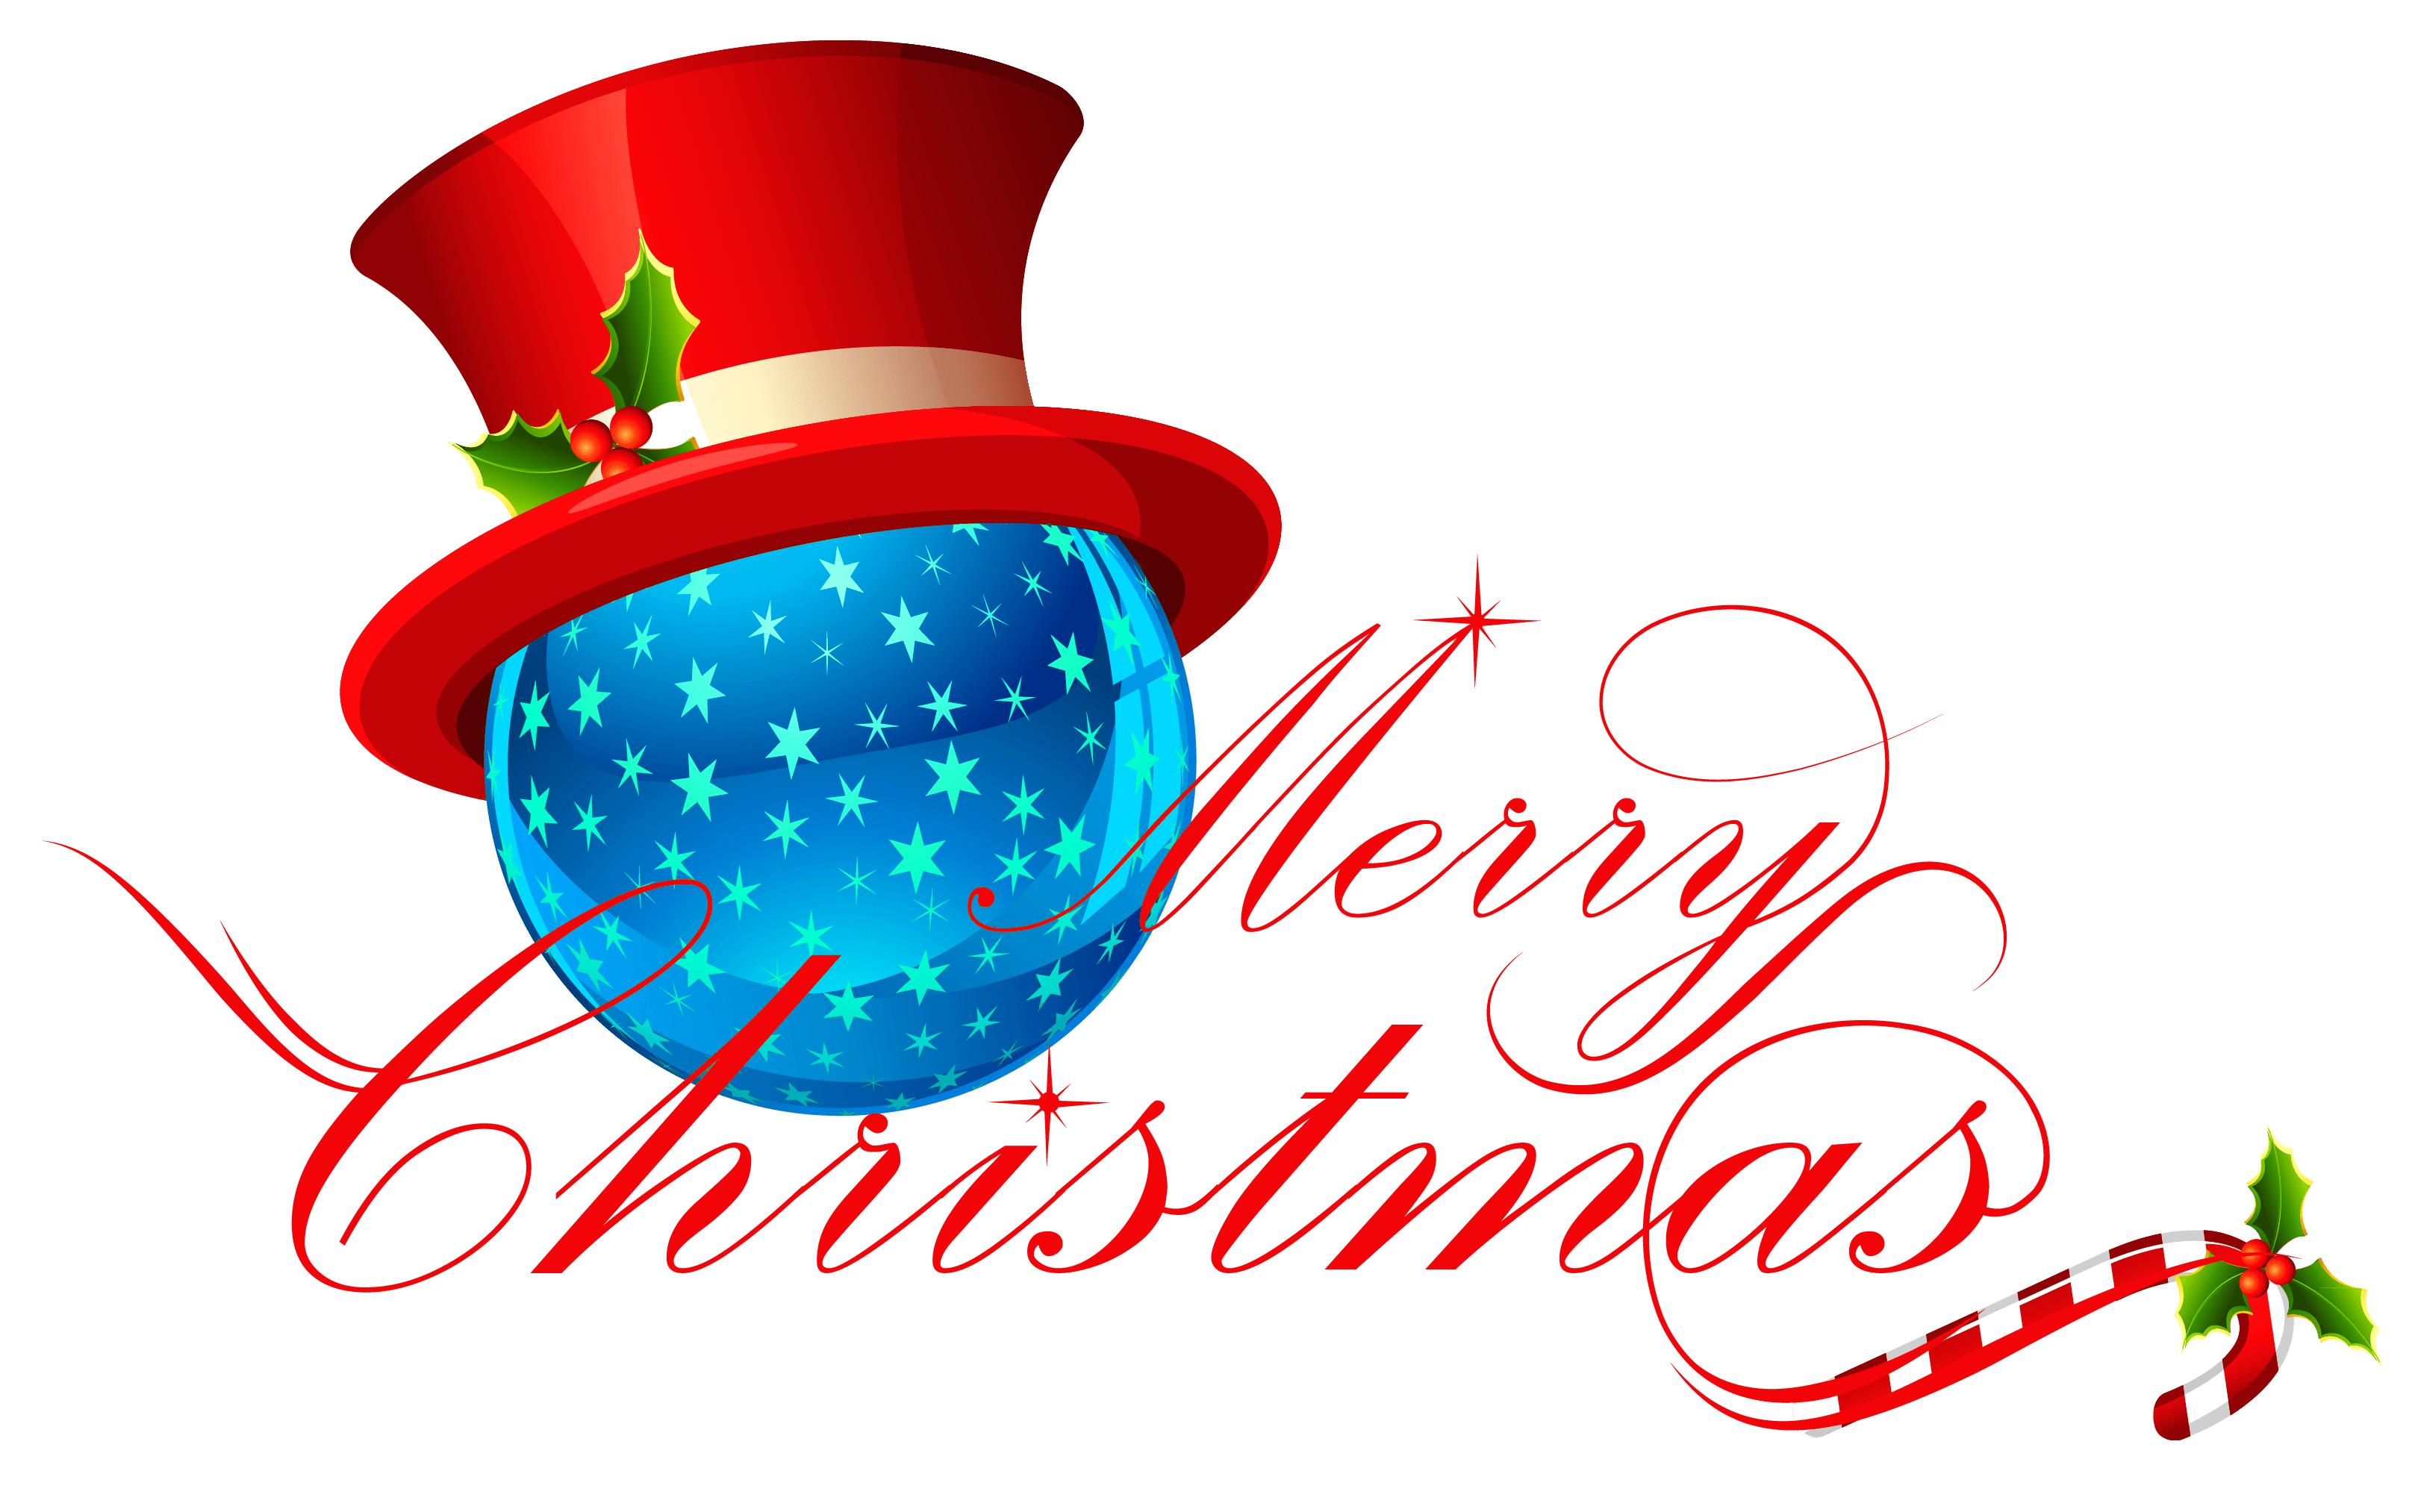 3239x2026 Merry Christmas Clipart Train